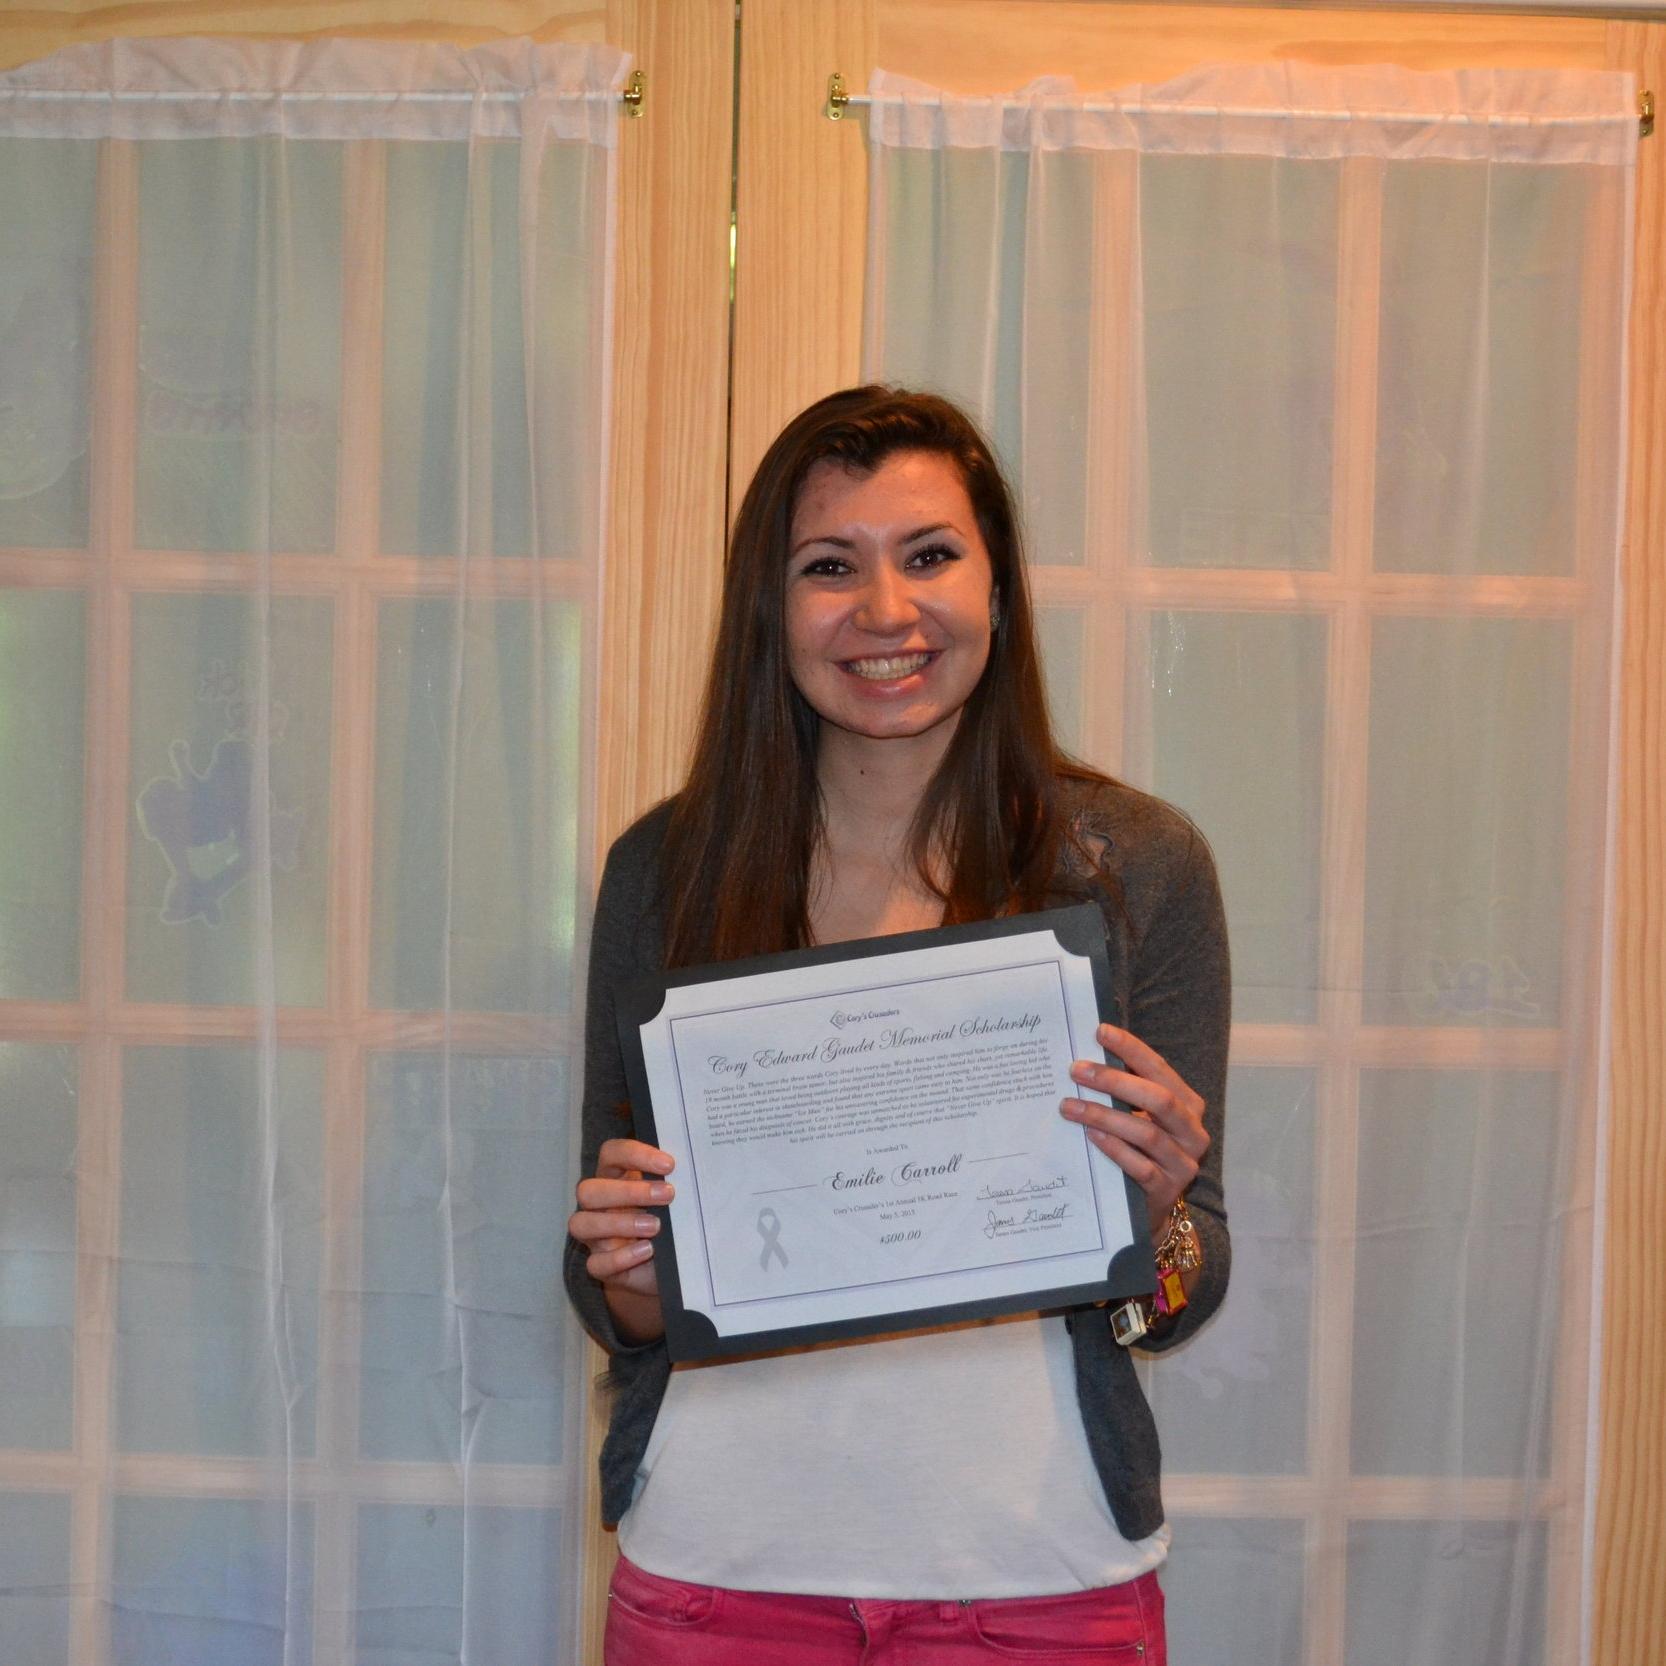 Emilie Carroll 2013 1st Annual 5K Scholarship recipient.JPG